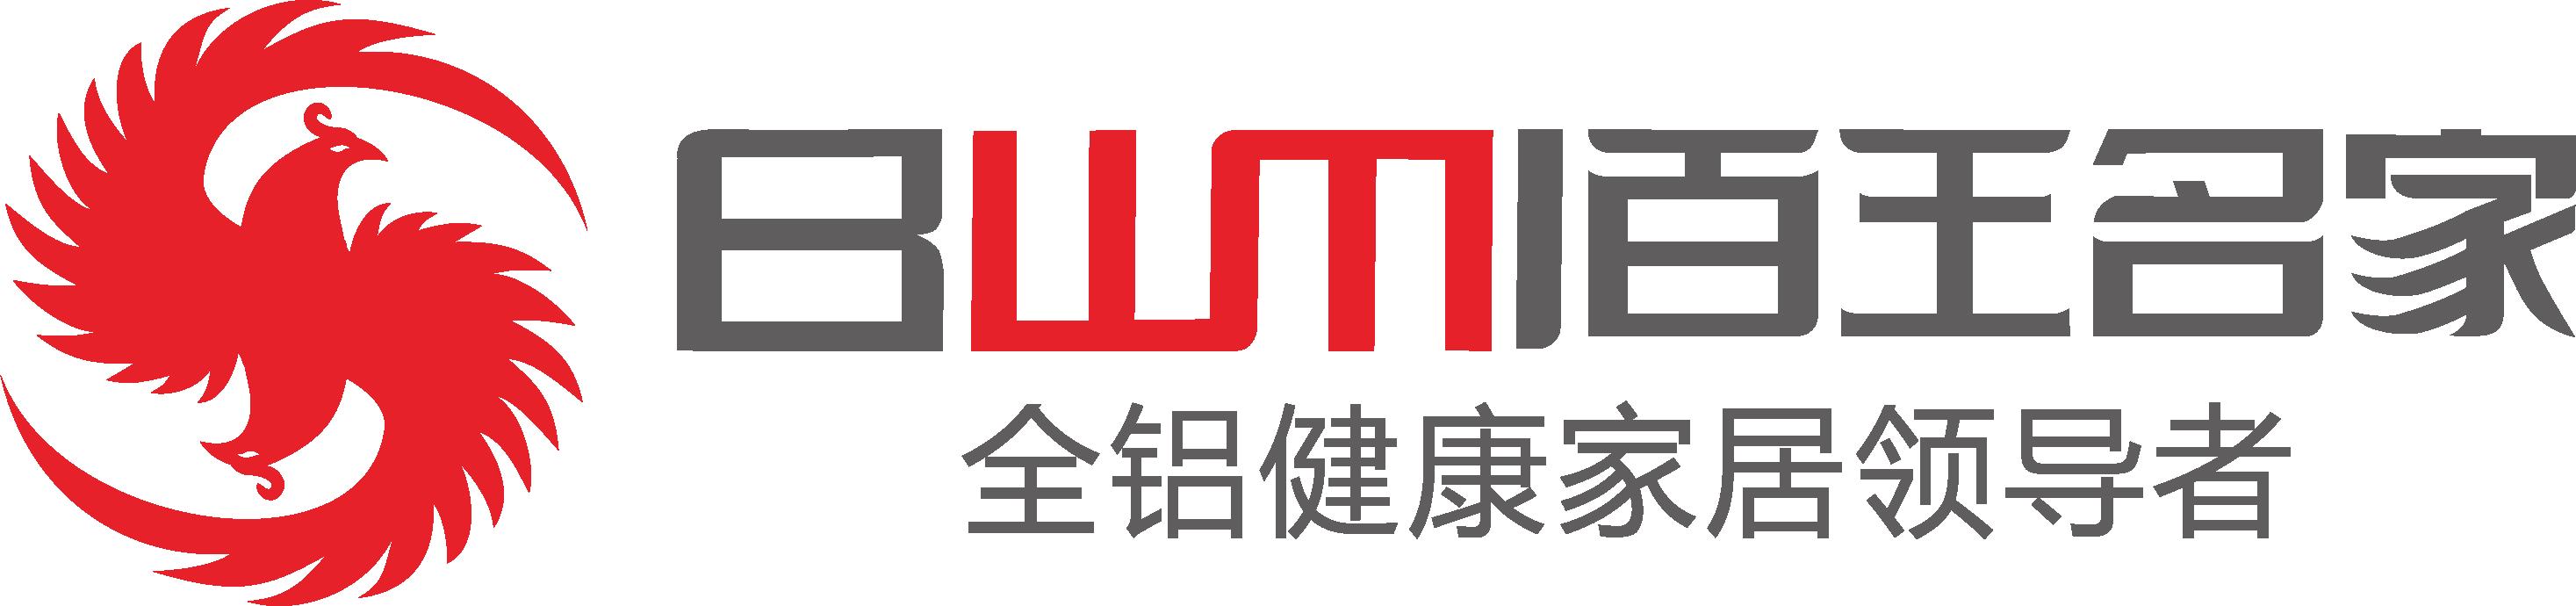 logo 标识 标志 设计 图标 2934_690